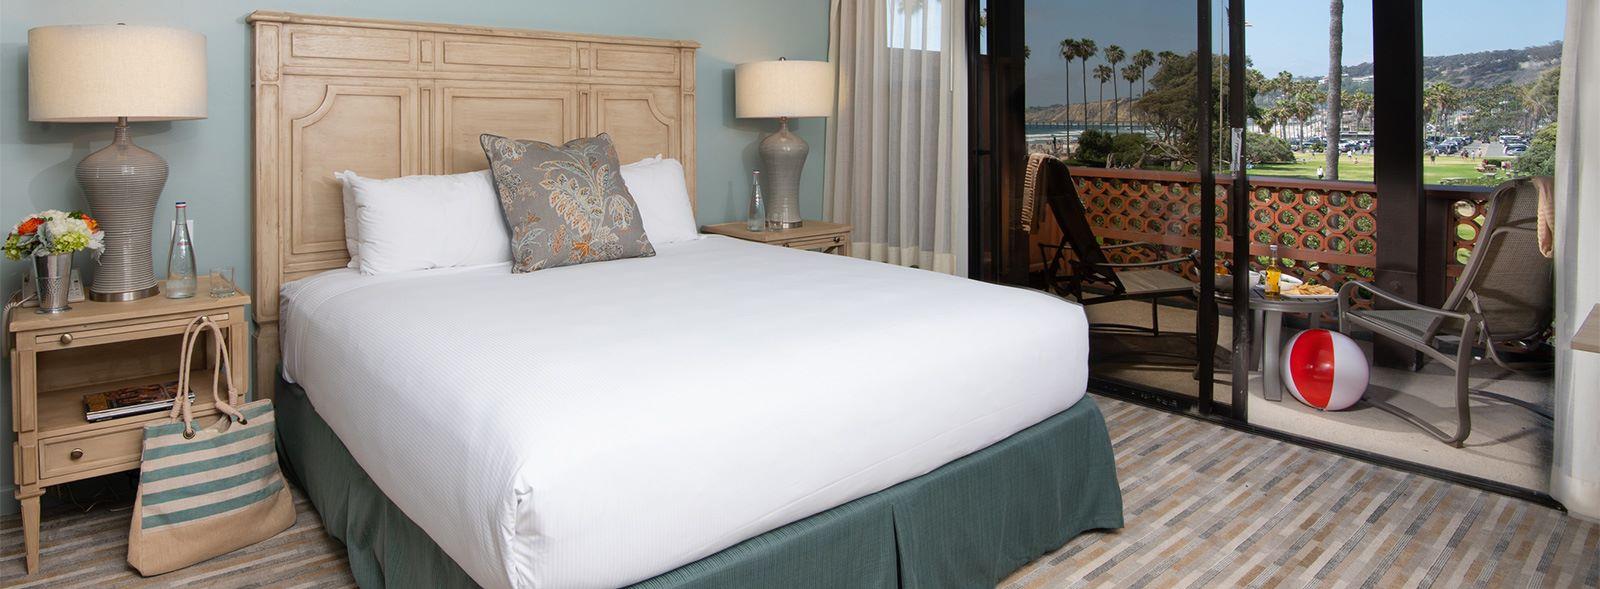 Save On Spring Beach Escapes at La Jolla Shores Hotel